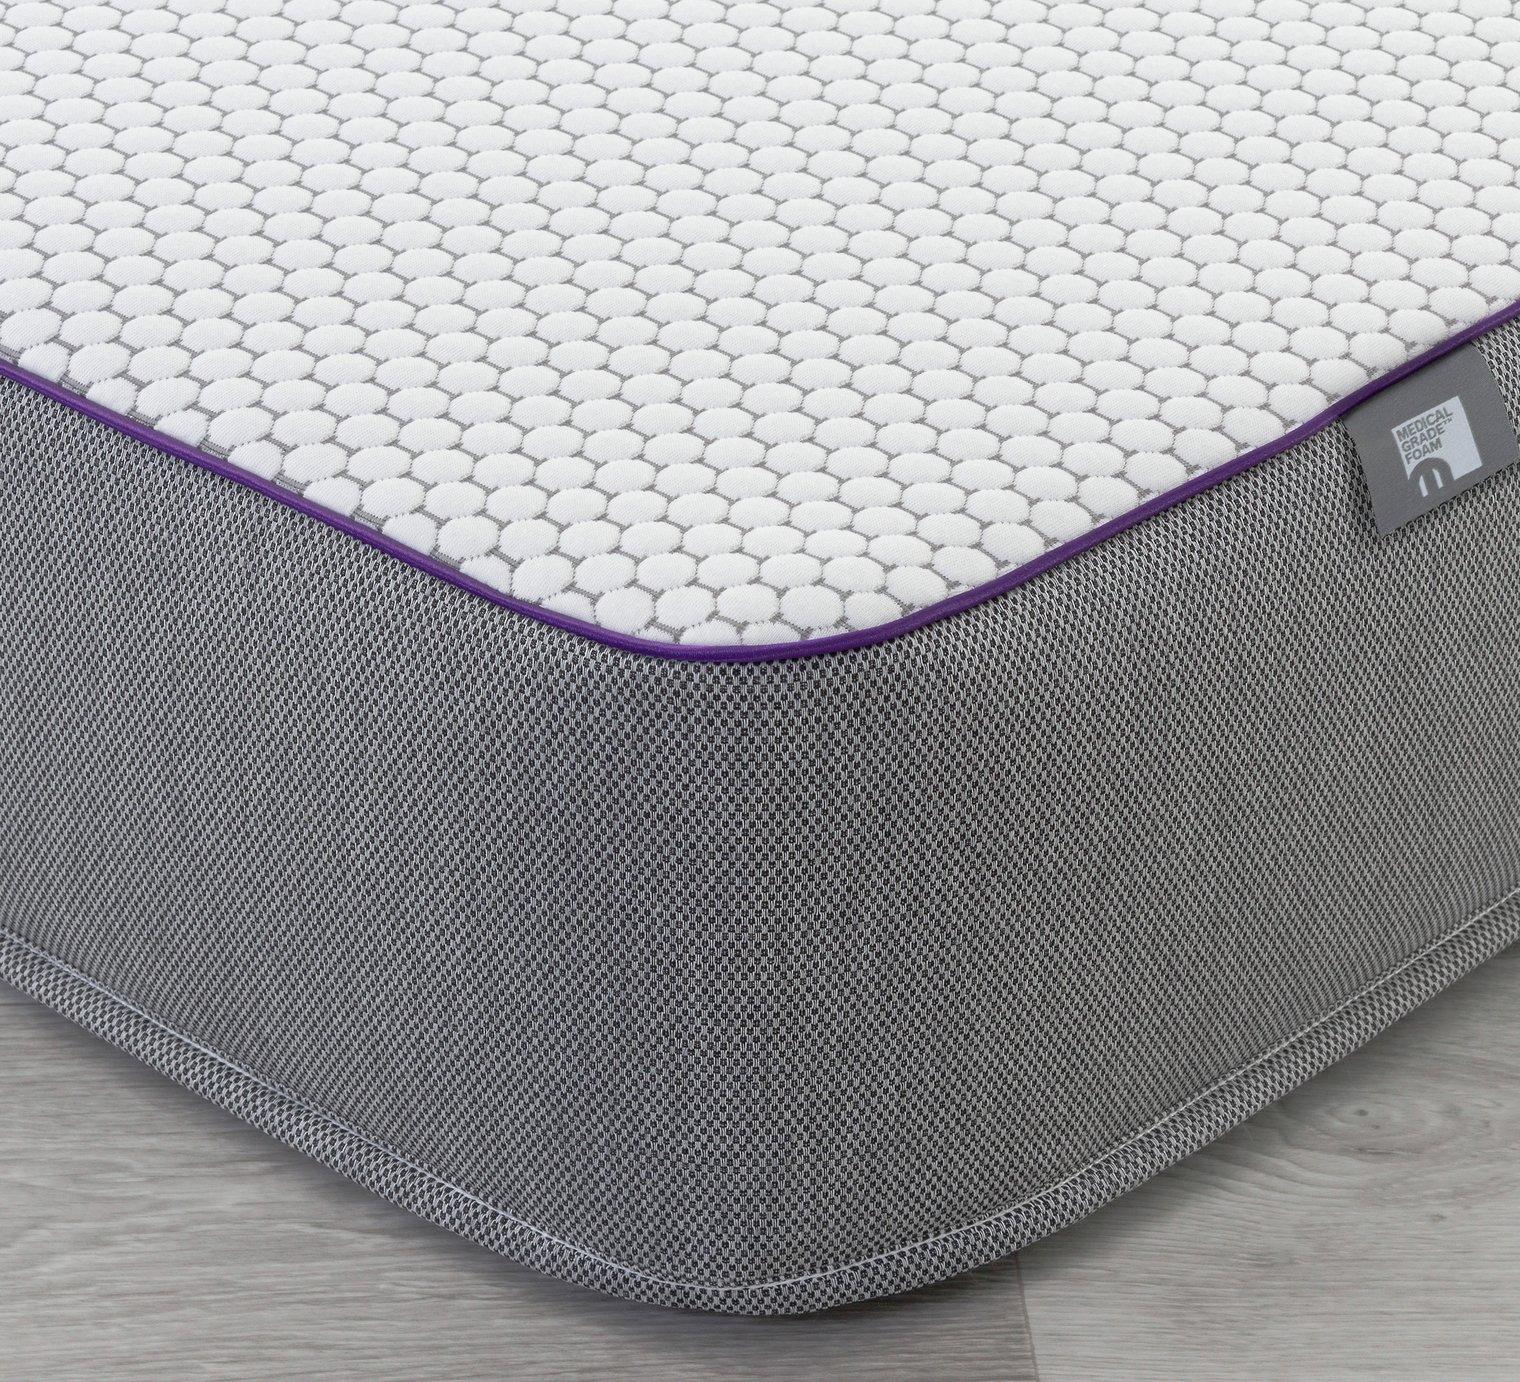 Mammoth wake essential superking mattress